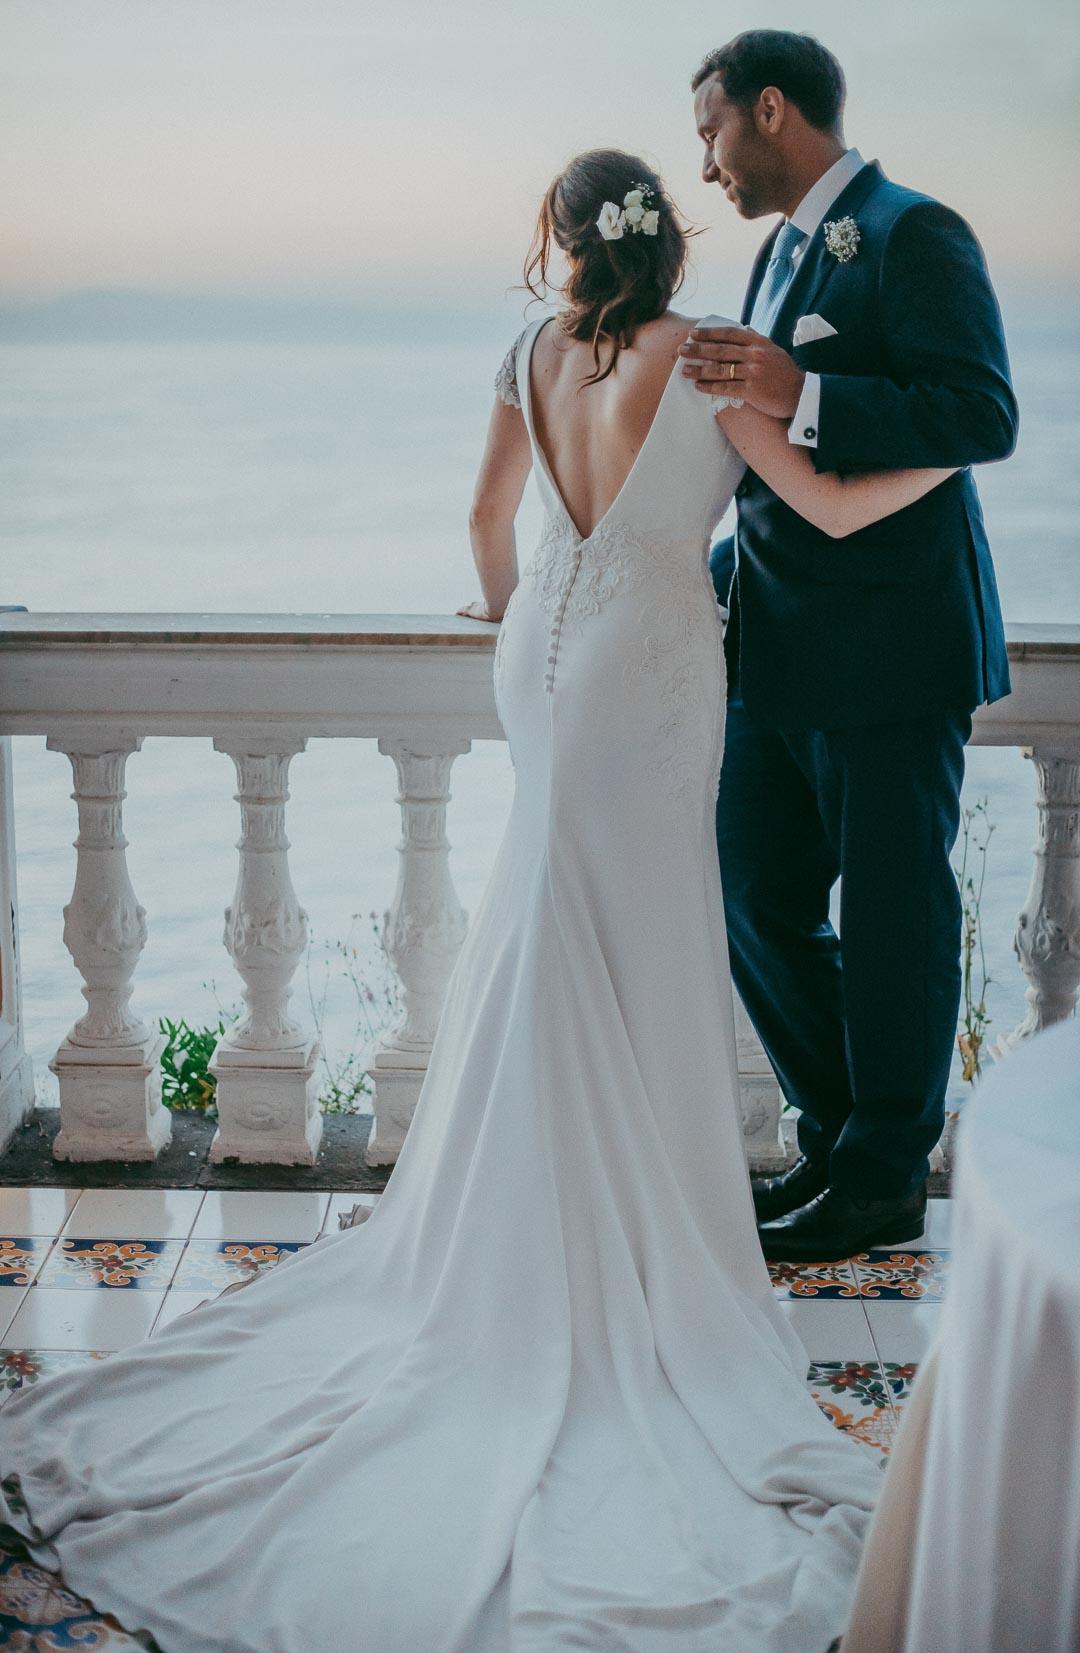 wedding-photographer-destination-fineart-bespoke-reportage-sorrento-parcodeiprincipi-vivianeizzo-spazio46-92